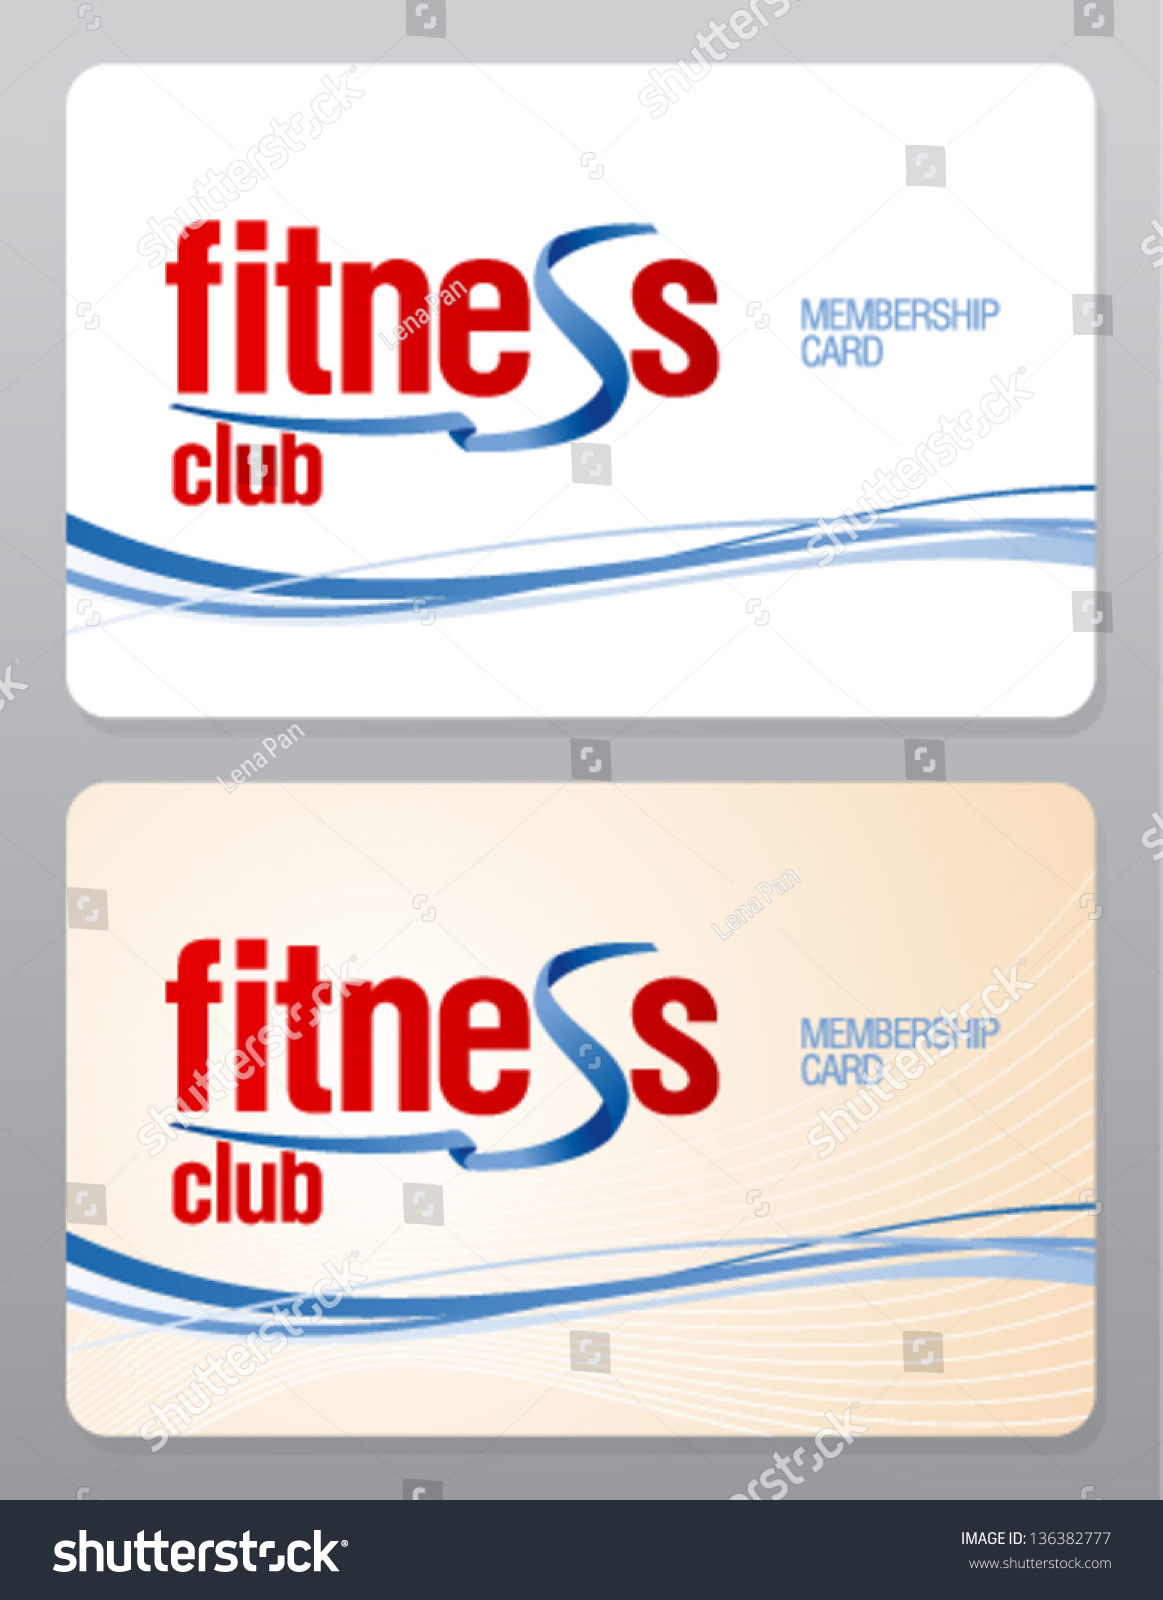 Fitness Club Membership Card Design Template Vector – Membership Card Template